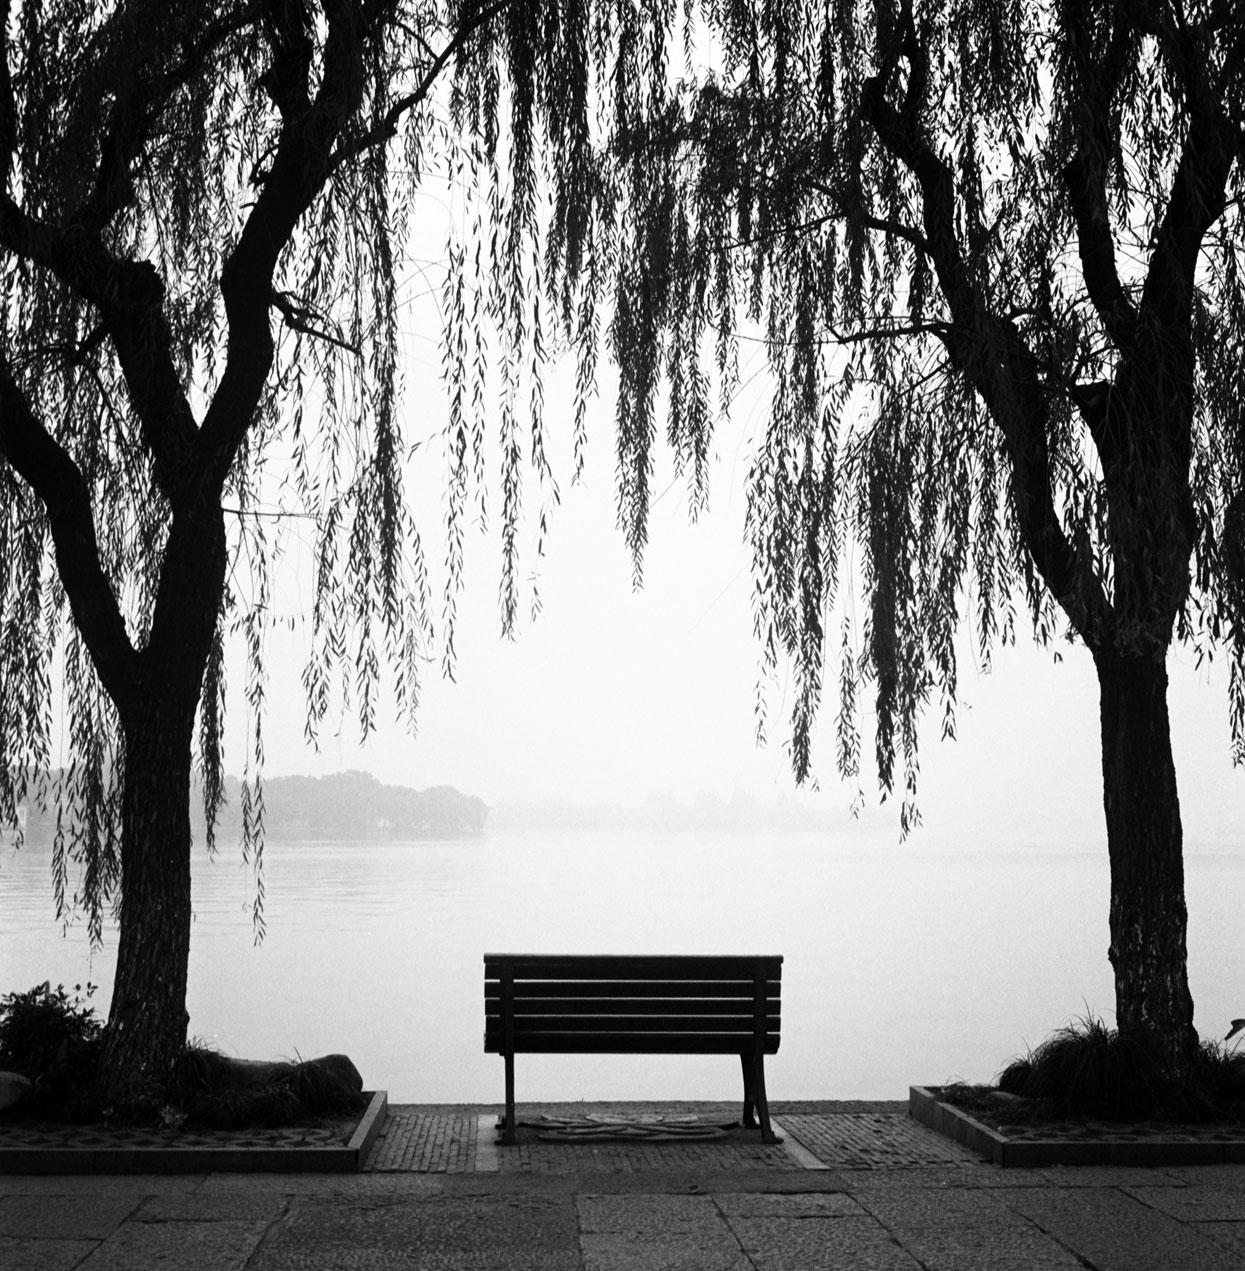 Lonely bench I, West lake, Hangzhou